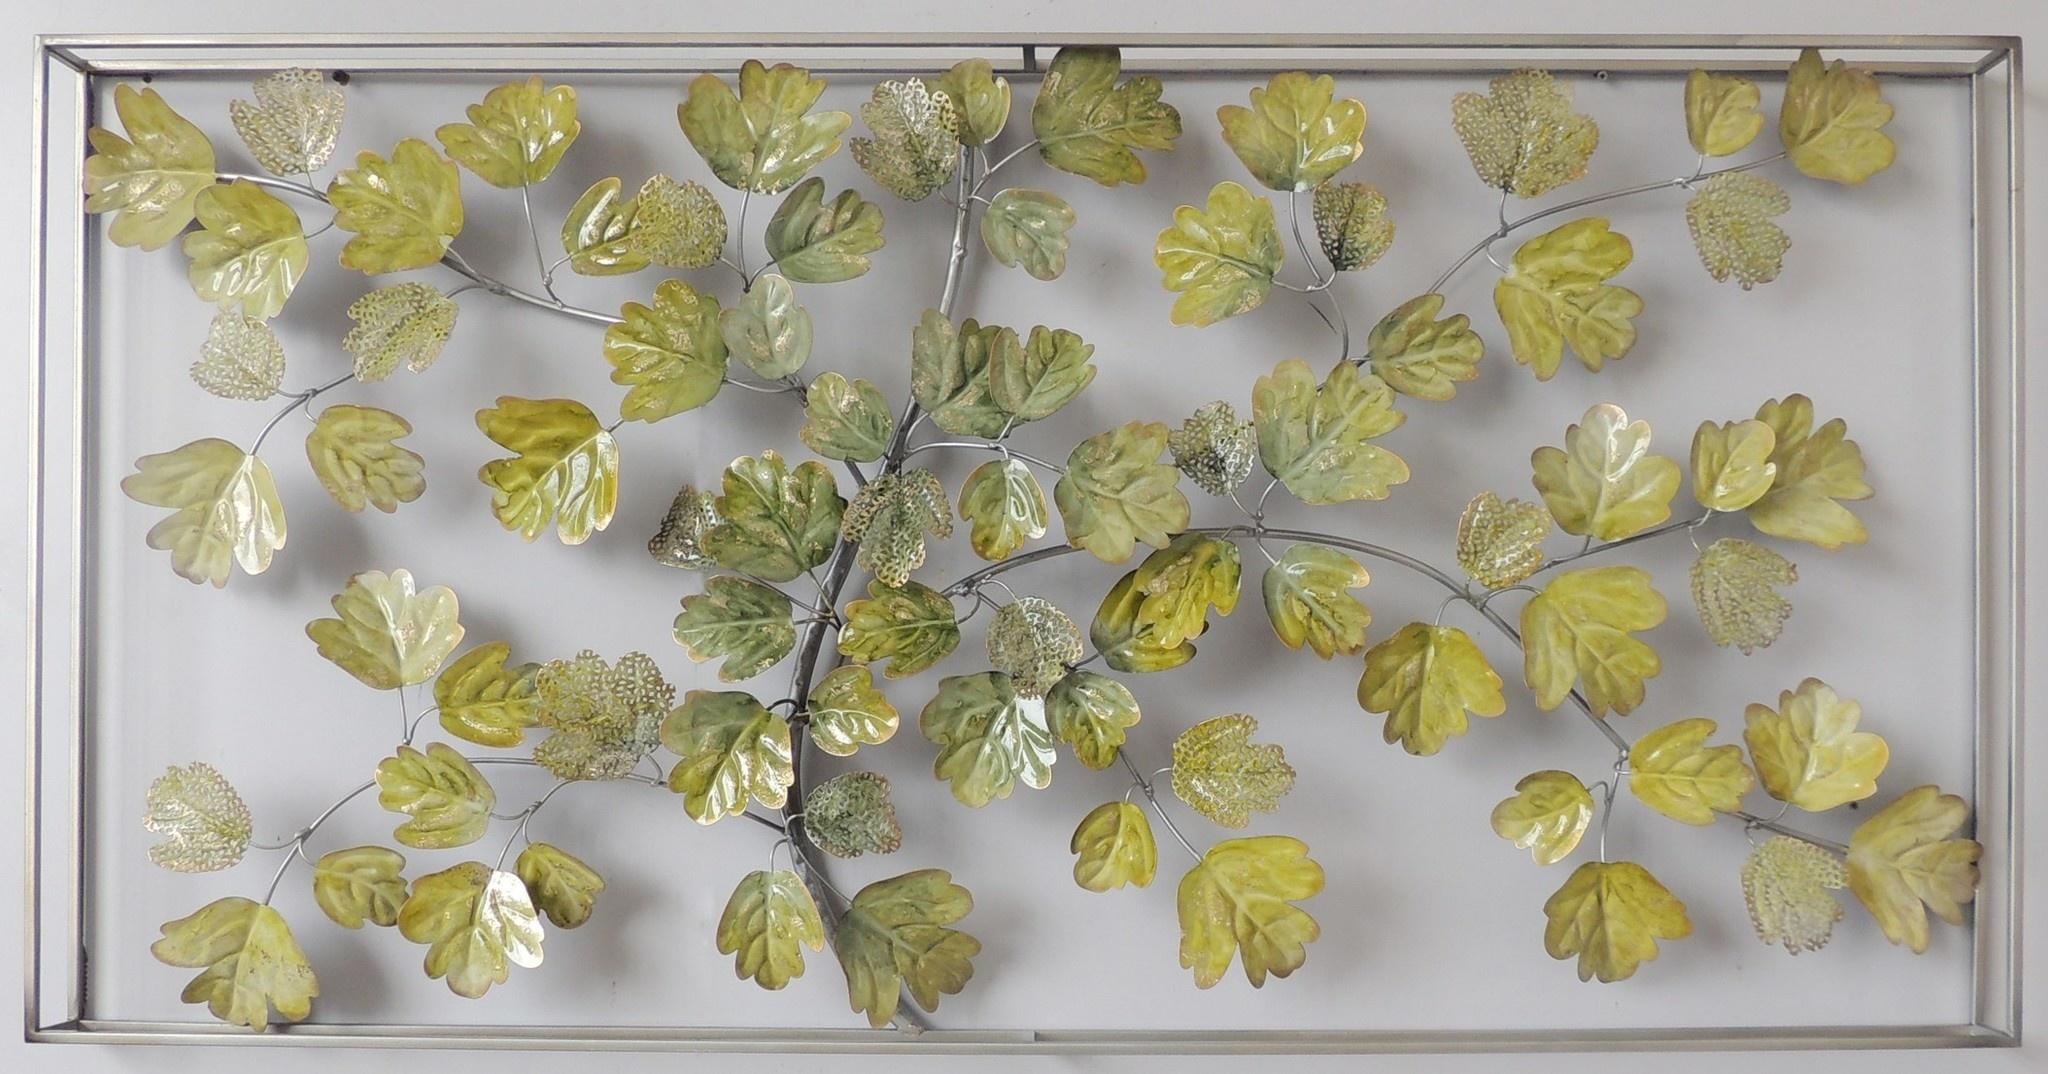 Wanddekoration 3D in Rahmen Laub 135x7x70cm